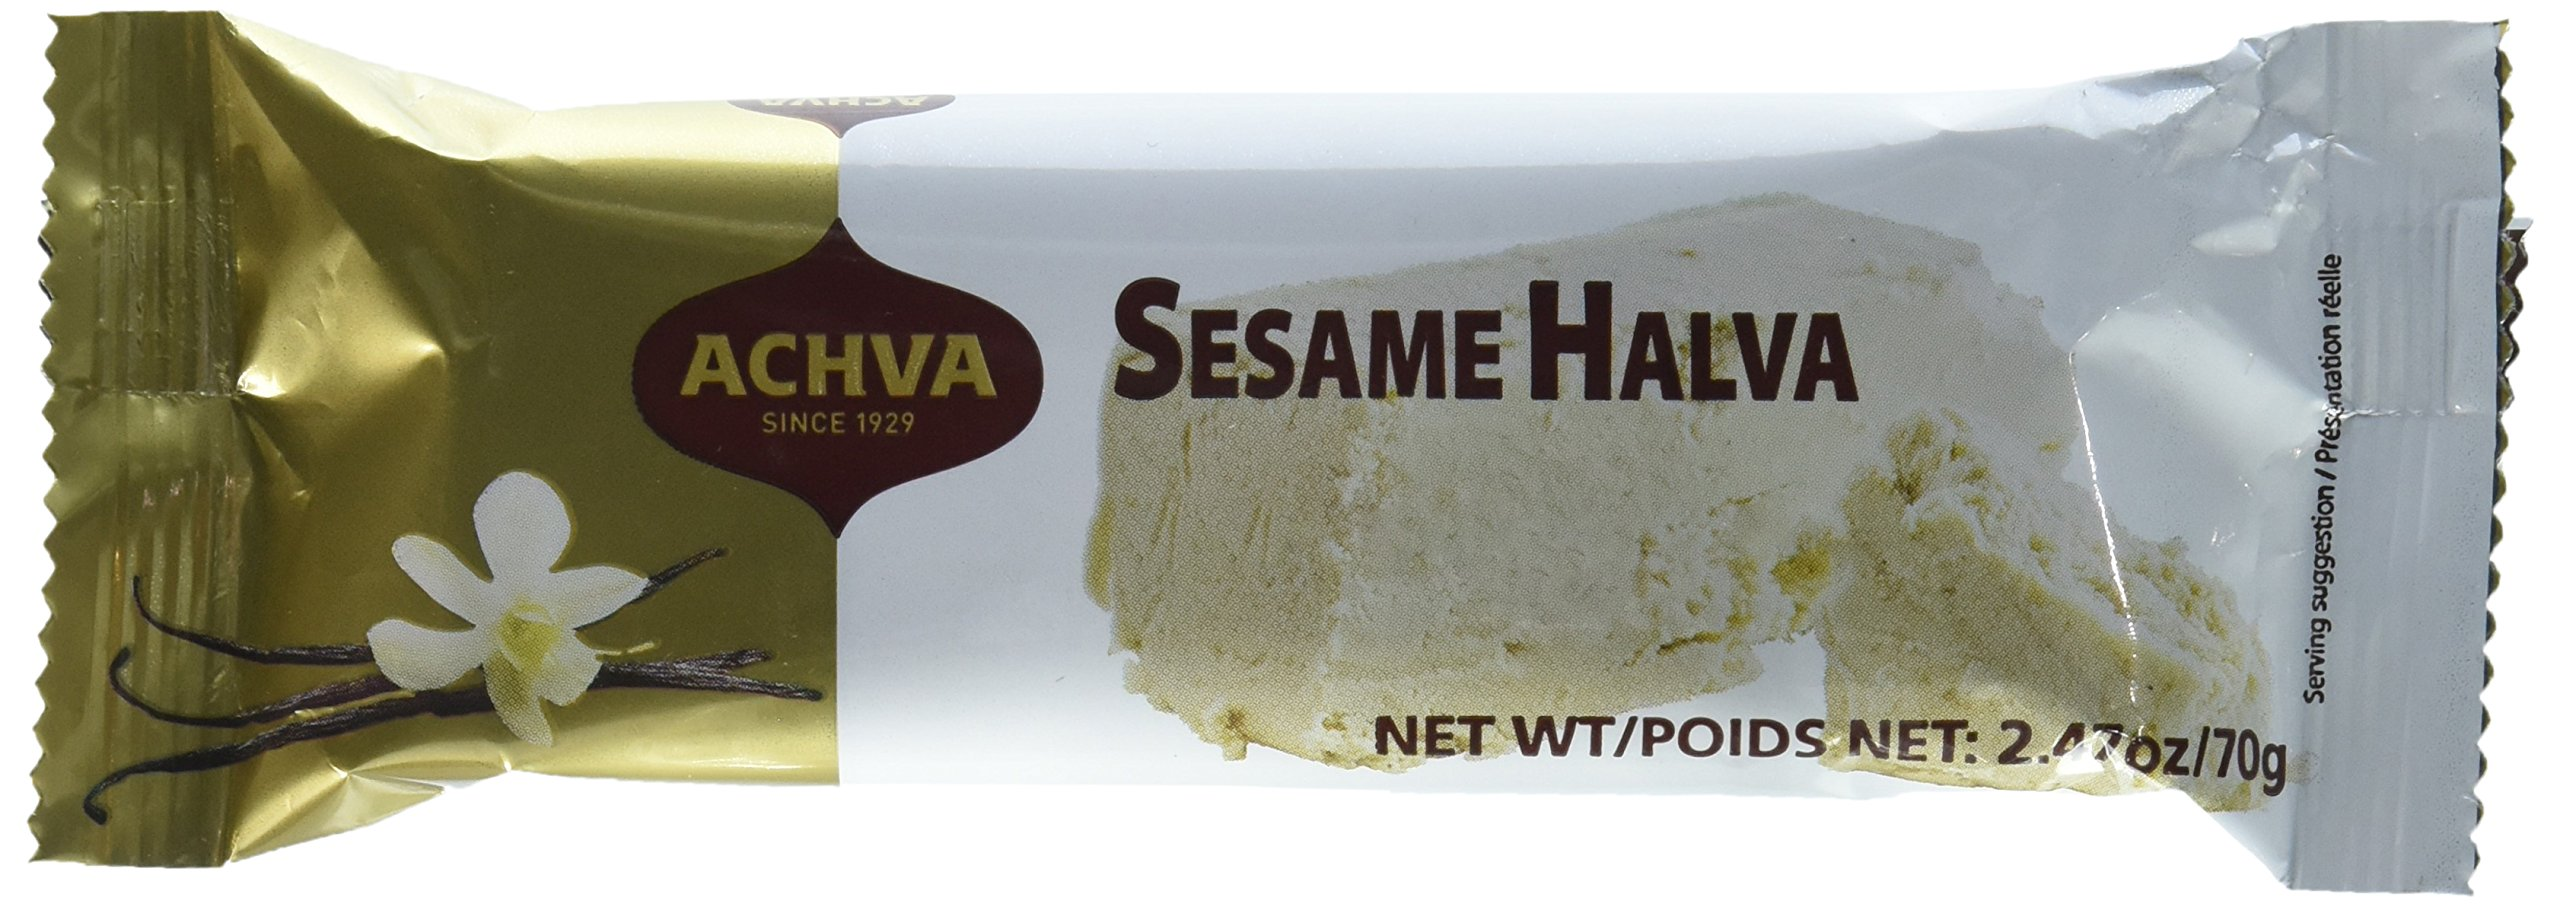 Achva Vanilla Flavor Kosher Halva Bars 25 Pack by Achva